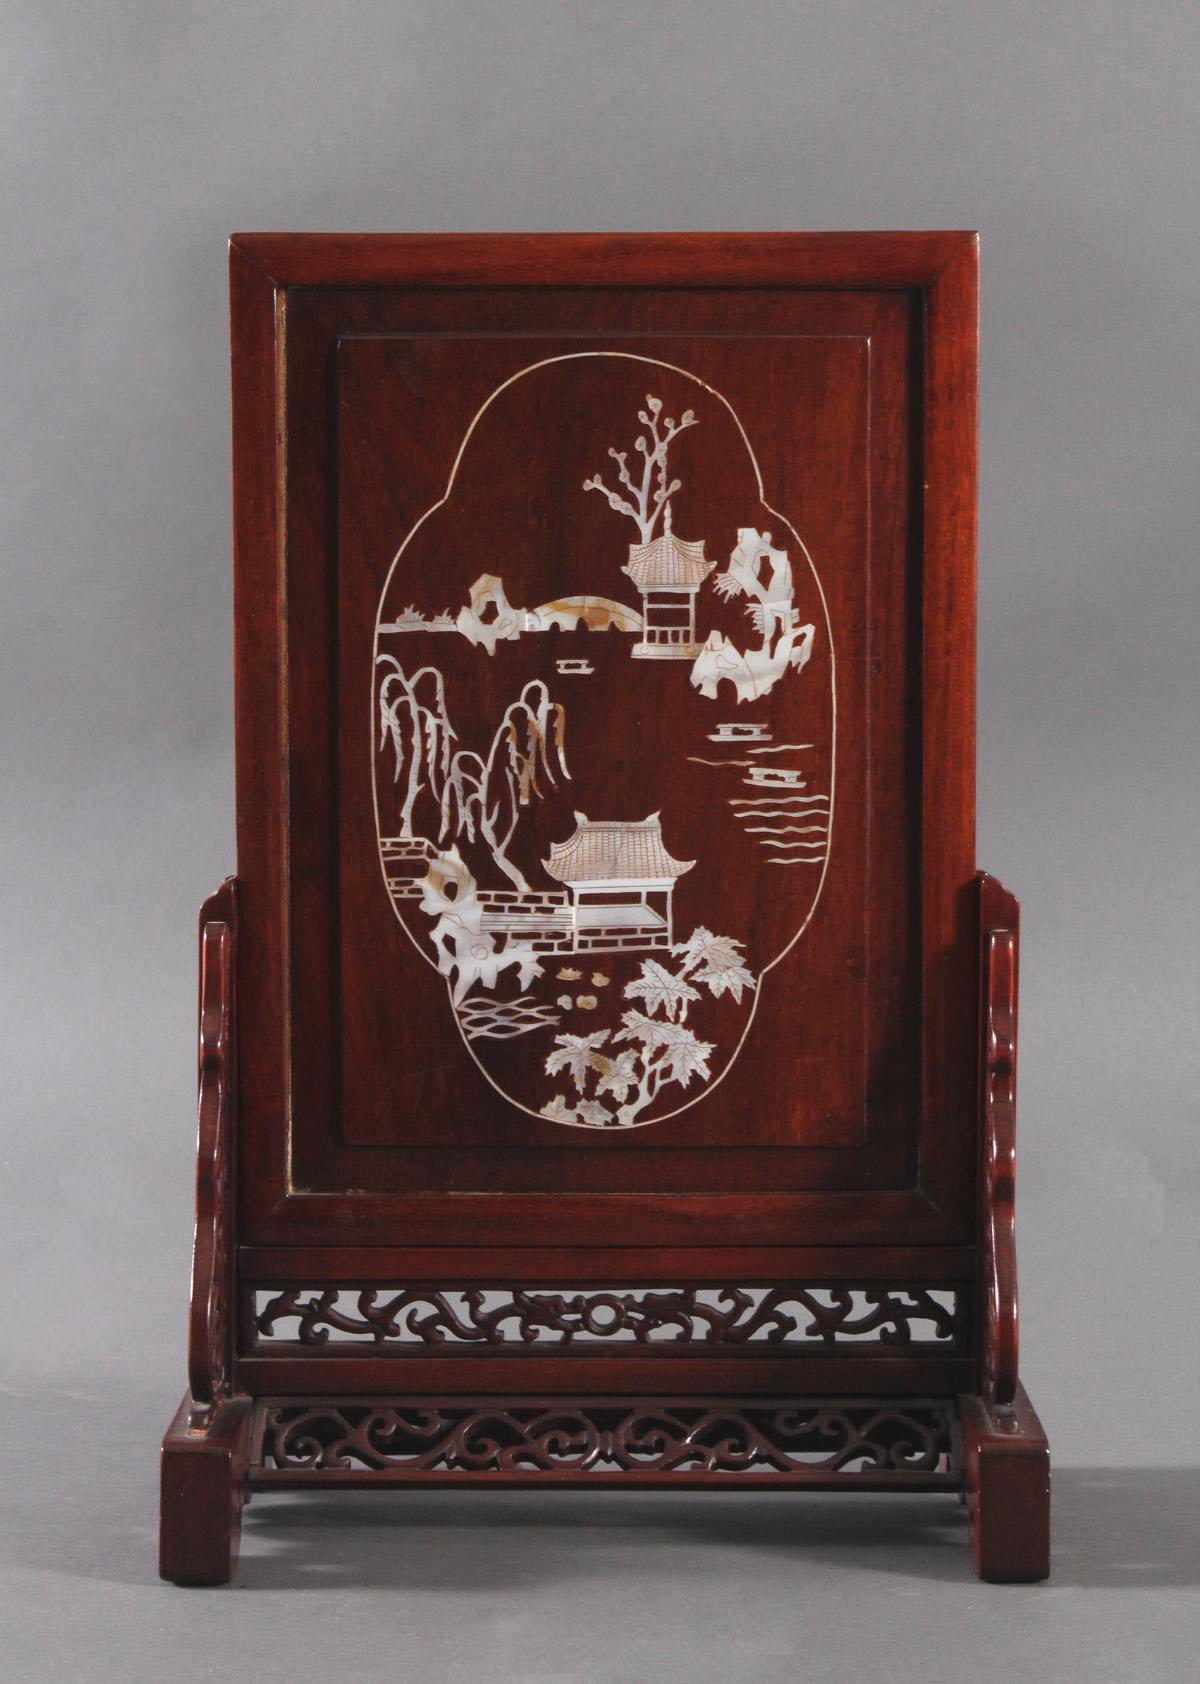 Tischpanel, China um 1920